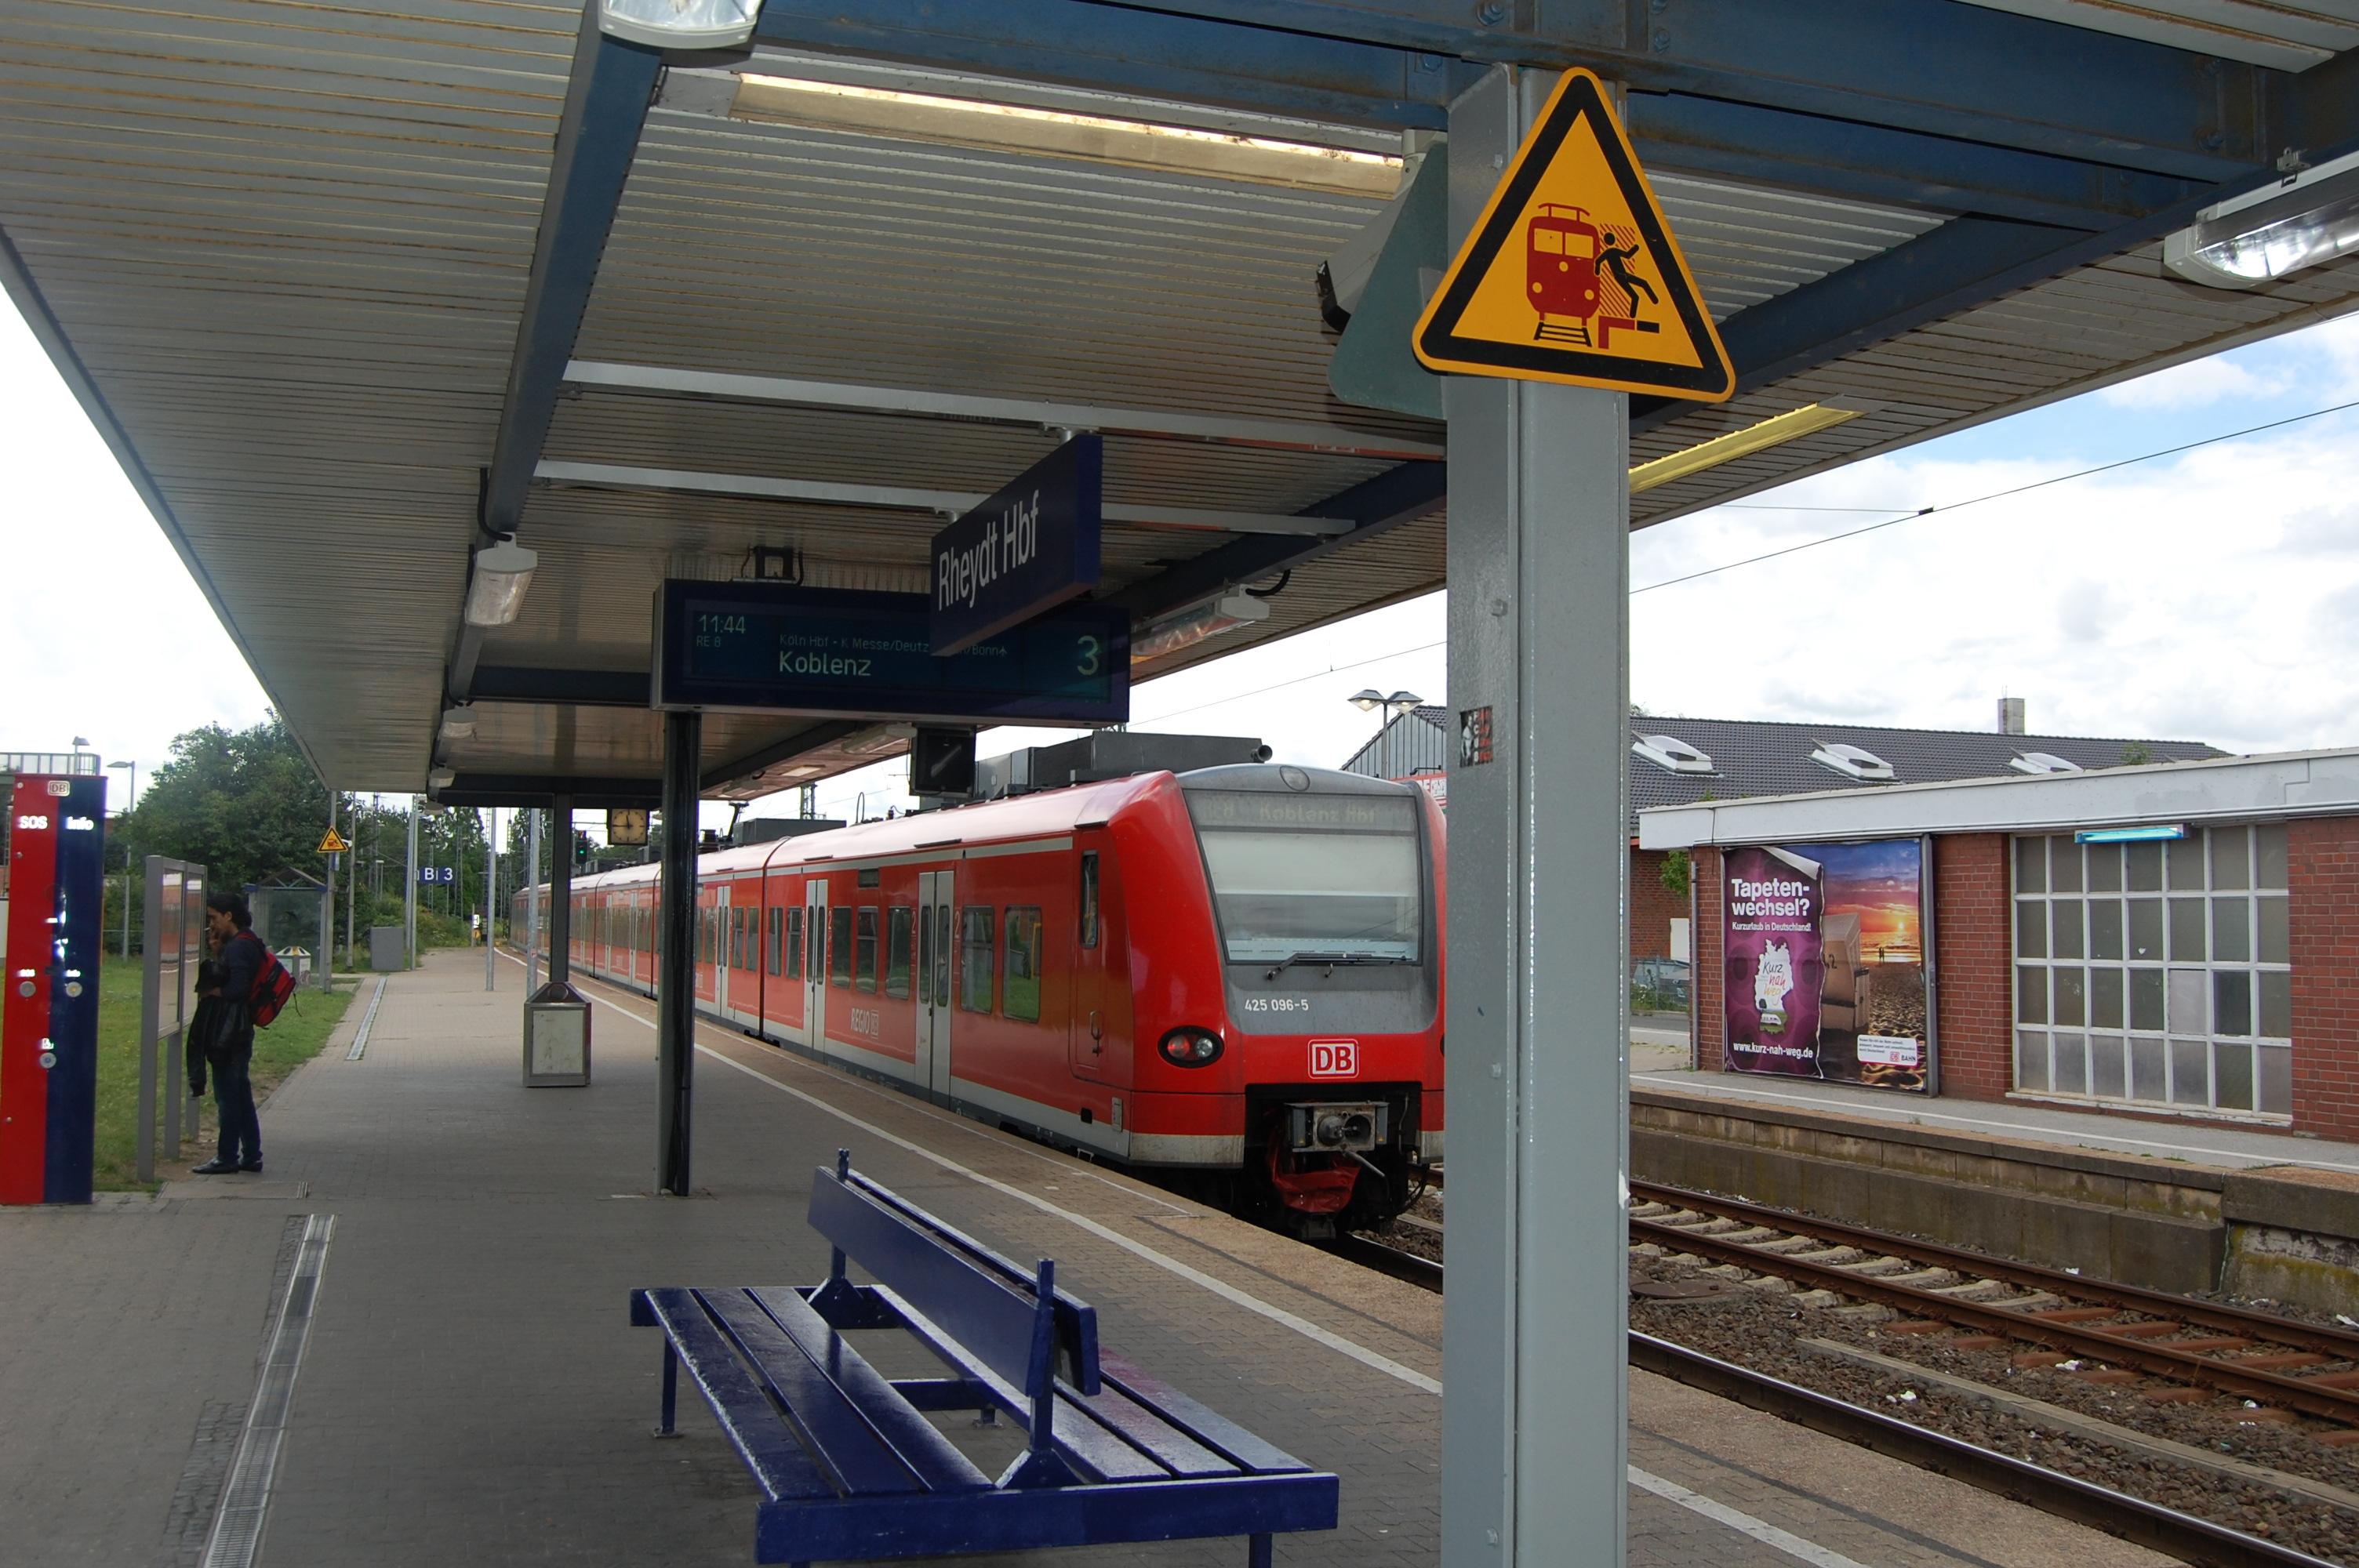 Bahnverbindung Köln Düsseldorf